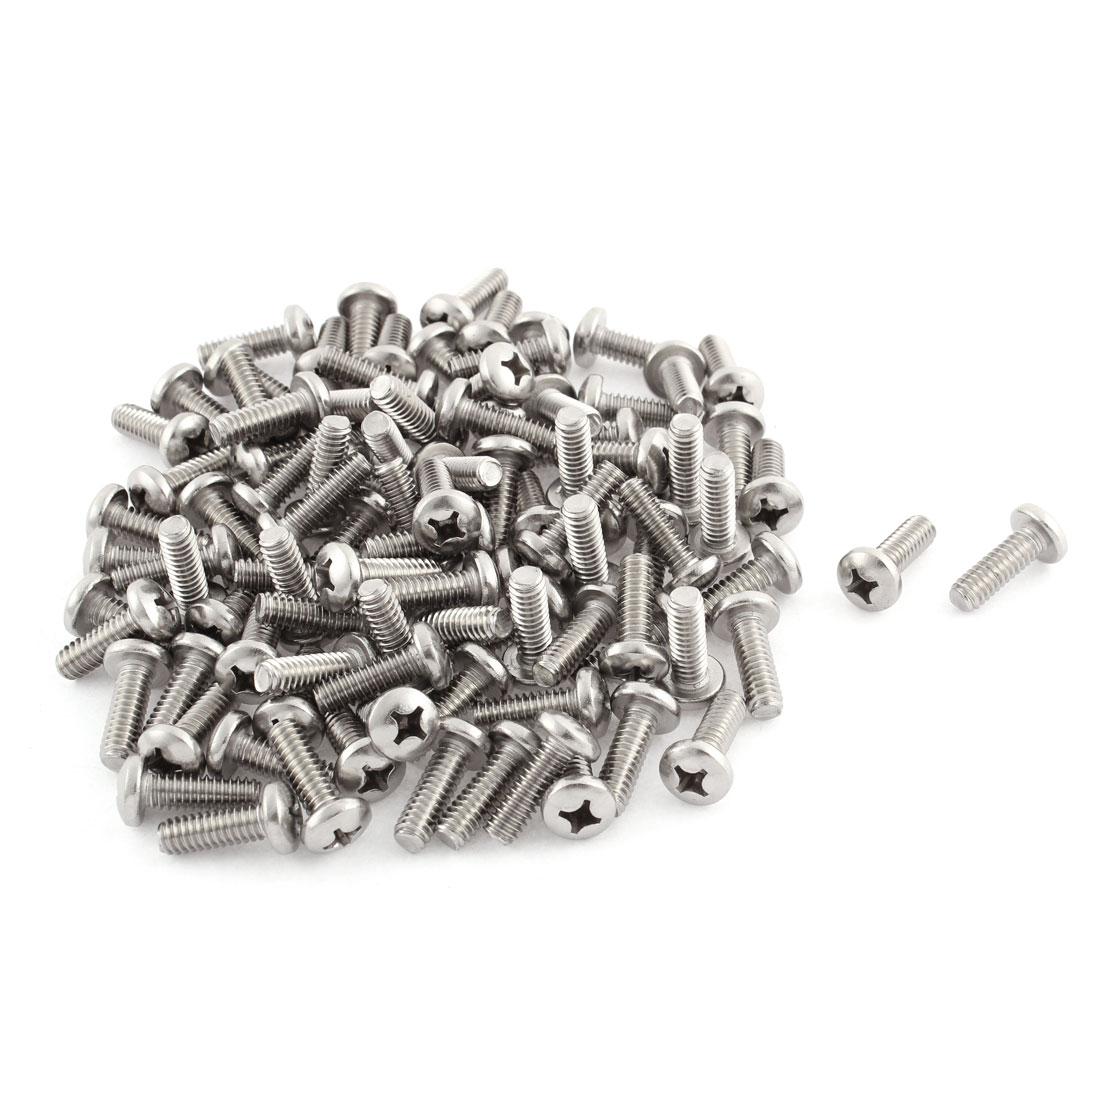 "24mm Long 1/4""x20x3/4"" Stainless Steel Phillips Cross Head Screws 100 Pcs"